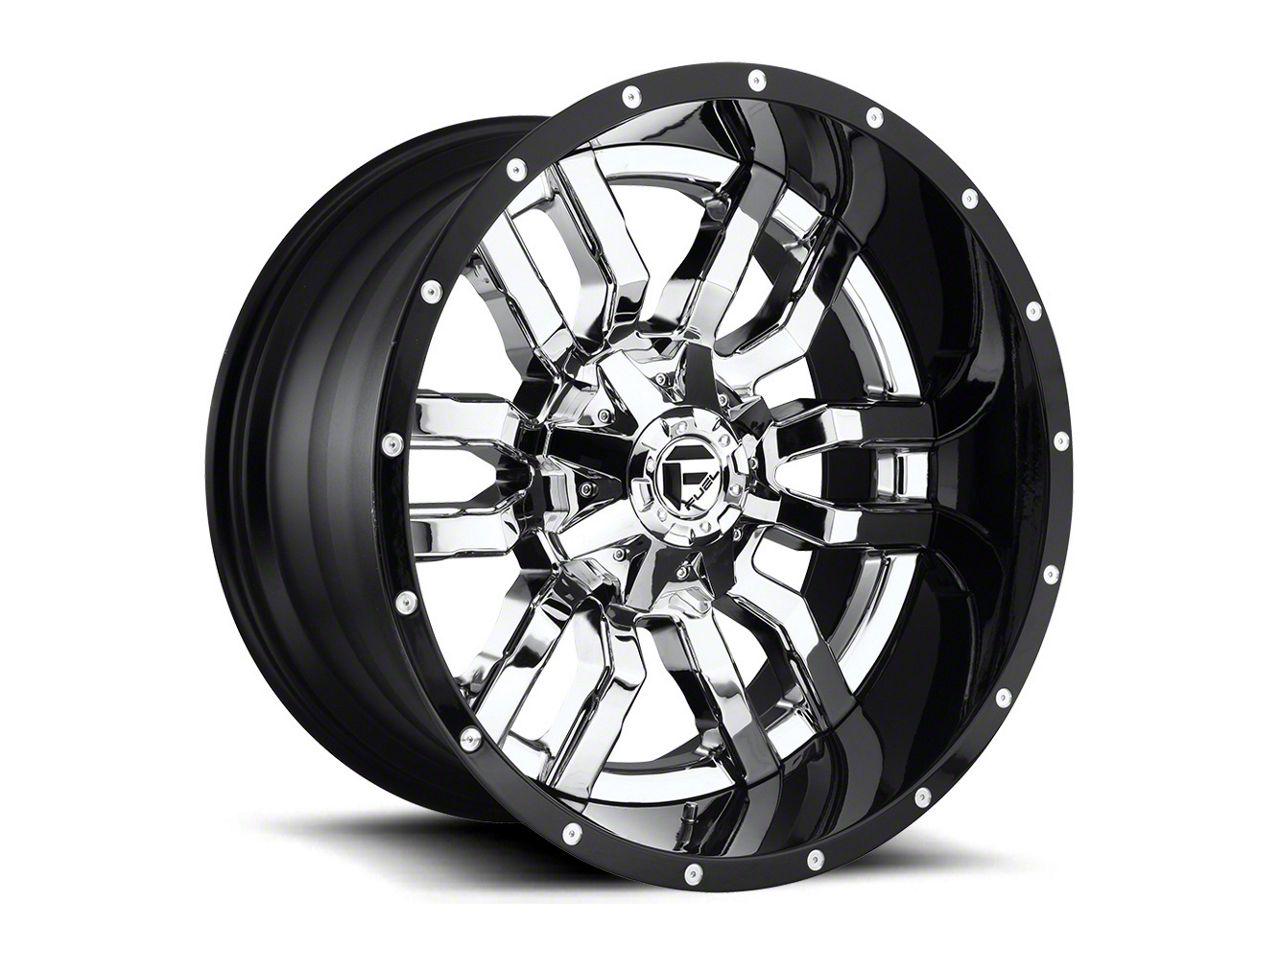 Fuel Wheels Sledge Chrome 5-Lug Wheel - 20x12 (02-18 RAM 1500, Excluding Mega Cab)